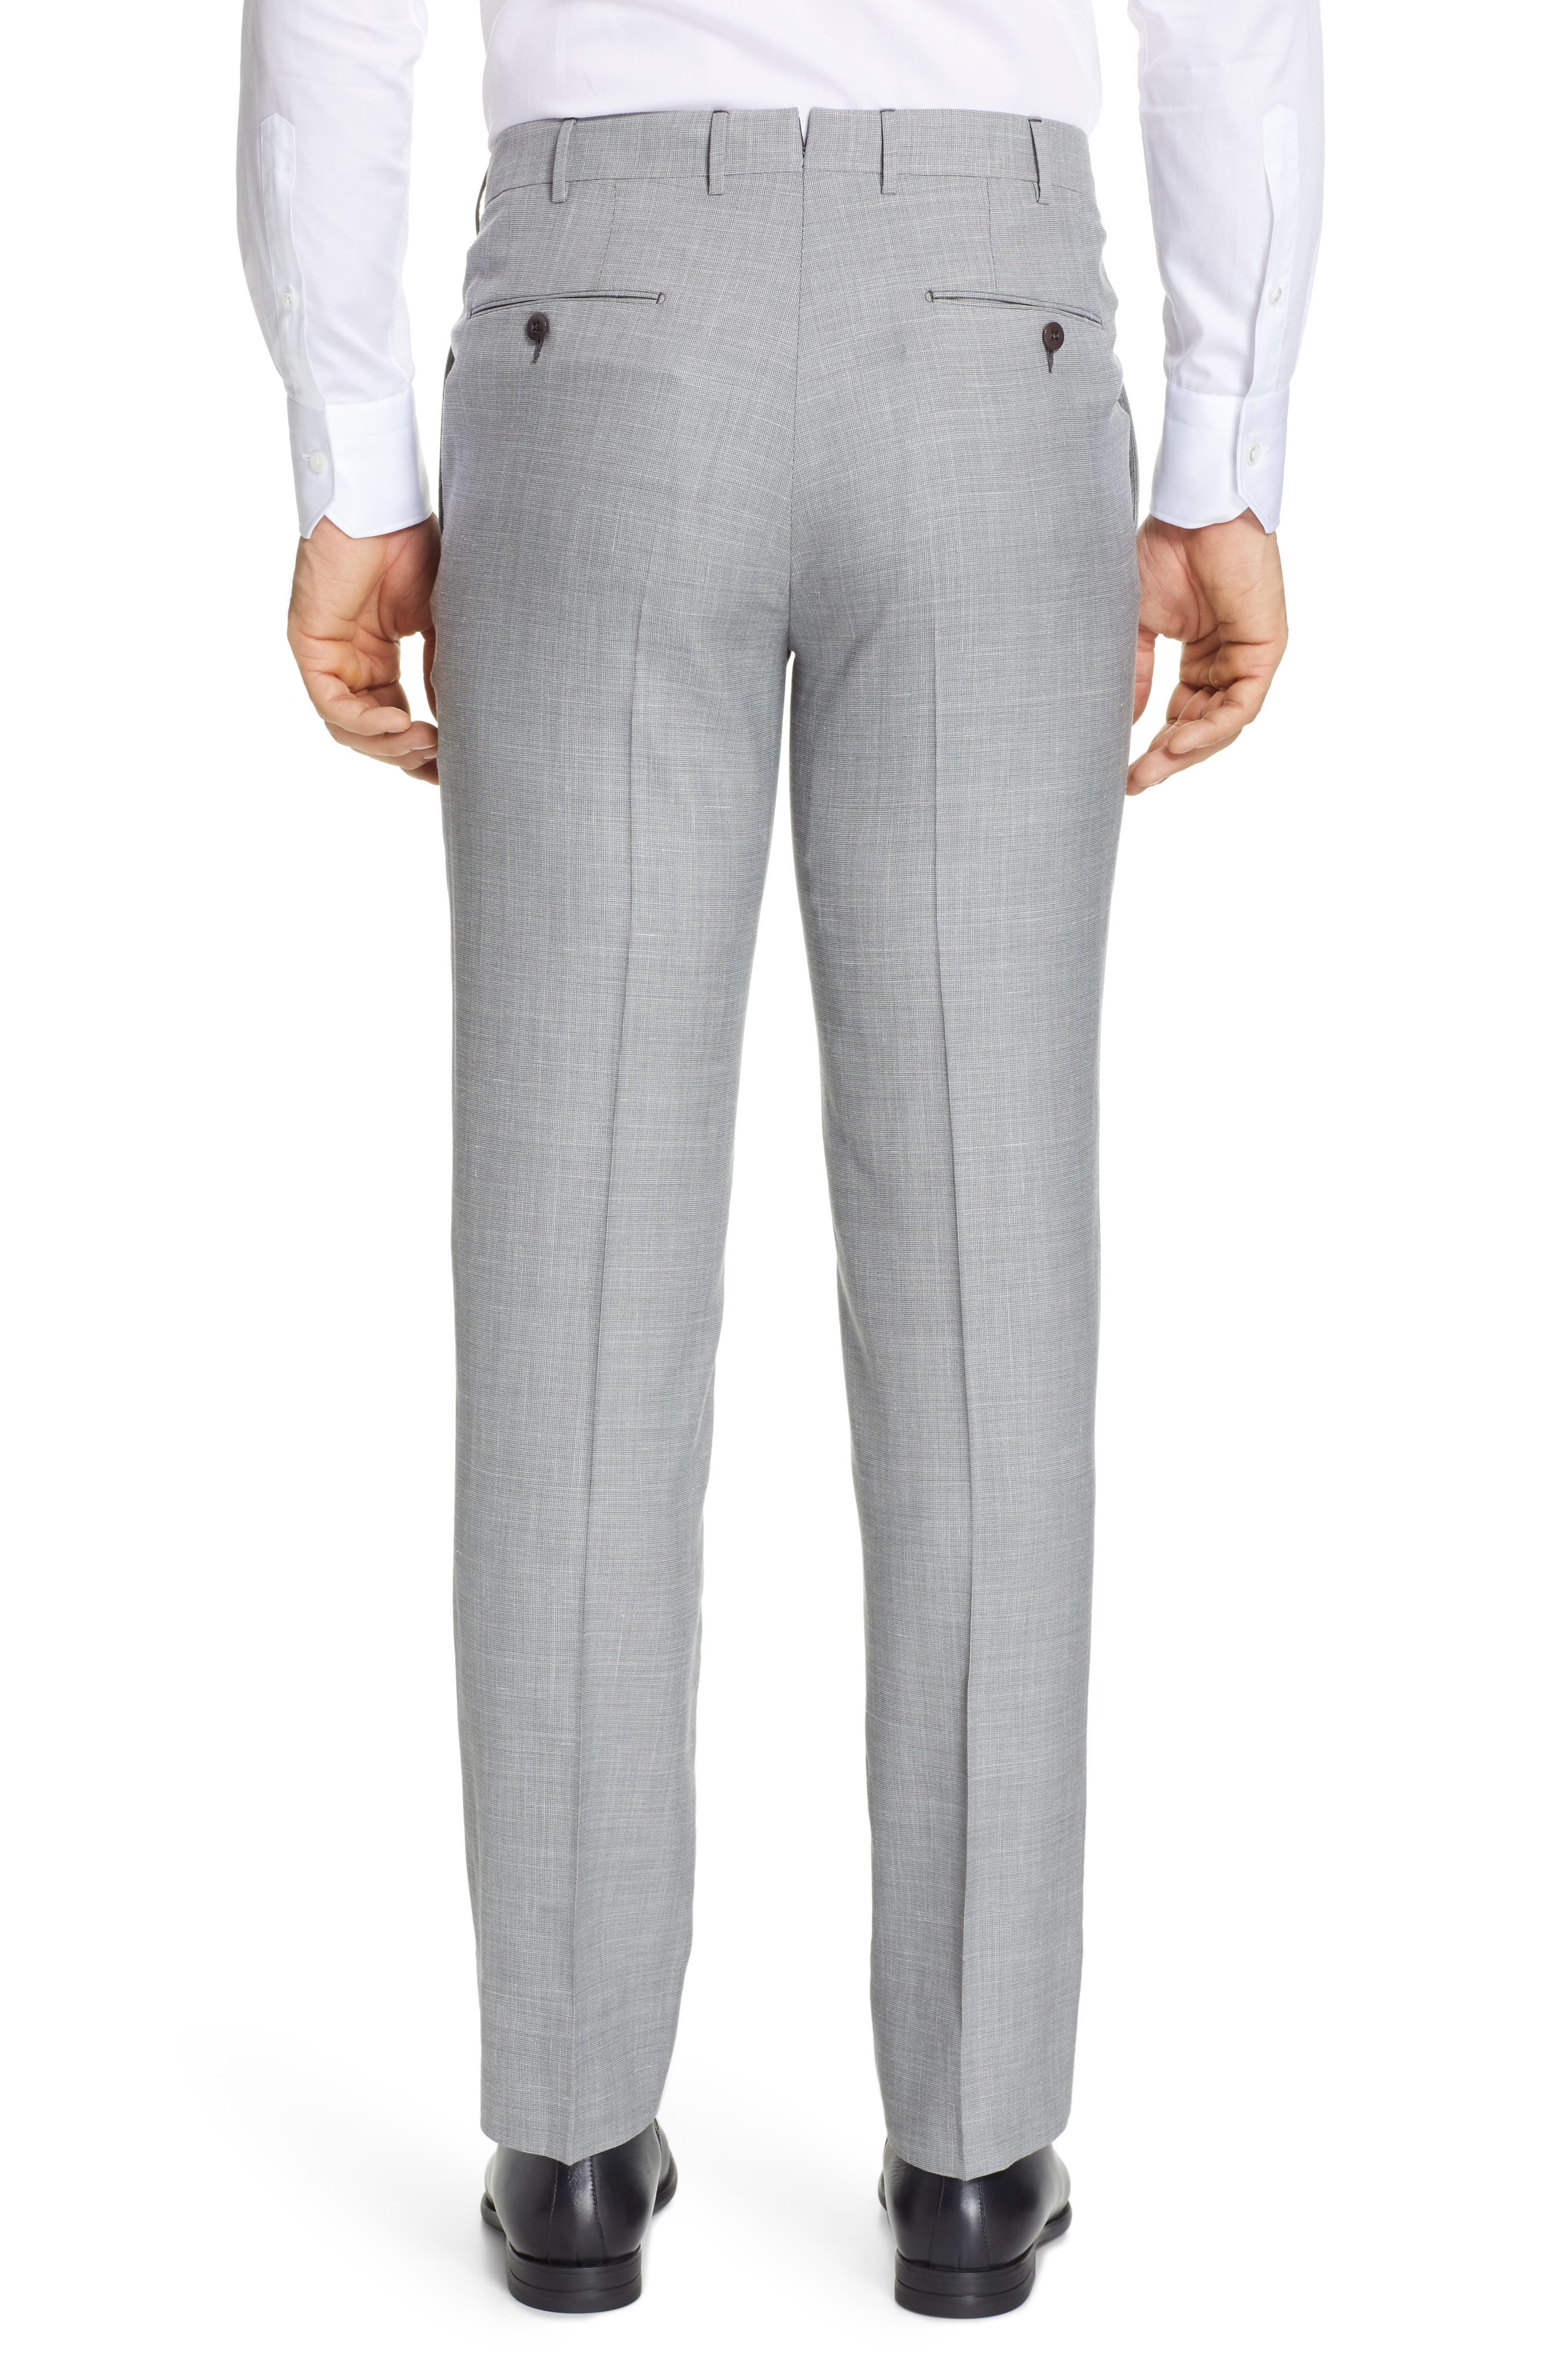 ERMENEGILDO ZEGNA, Trofeo Flat Front Solid Wool Blend Trousers, Alternate thumbnail 2, color, LIGHT GREY